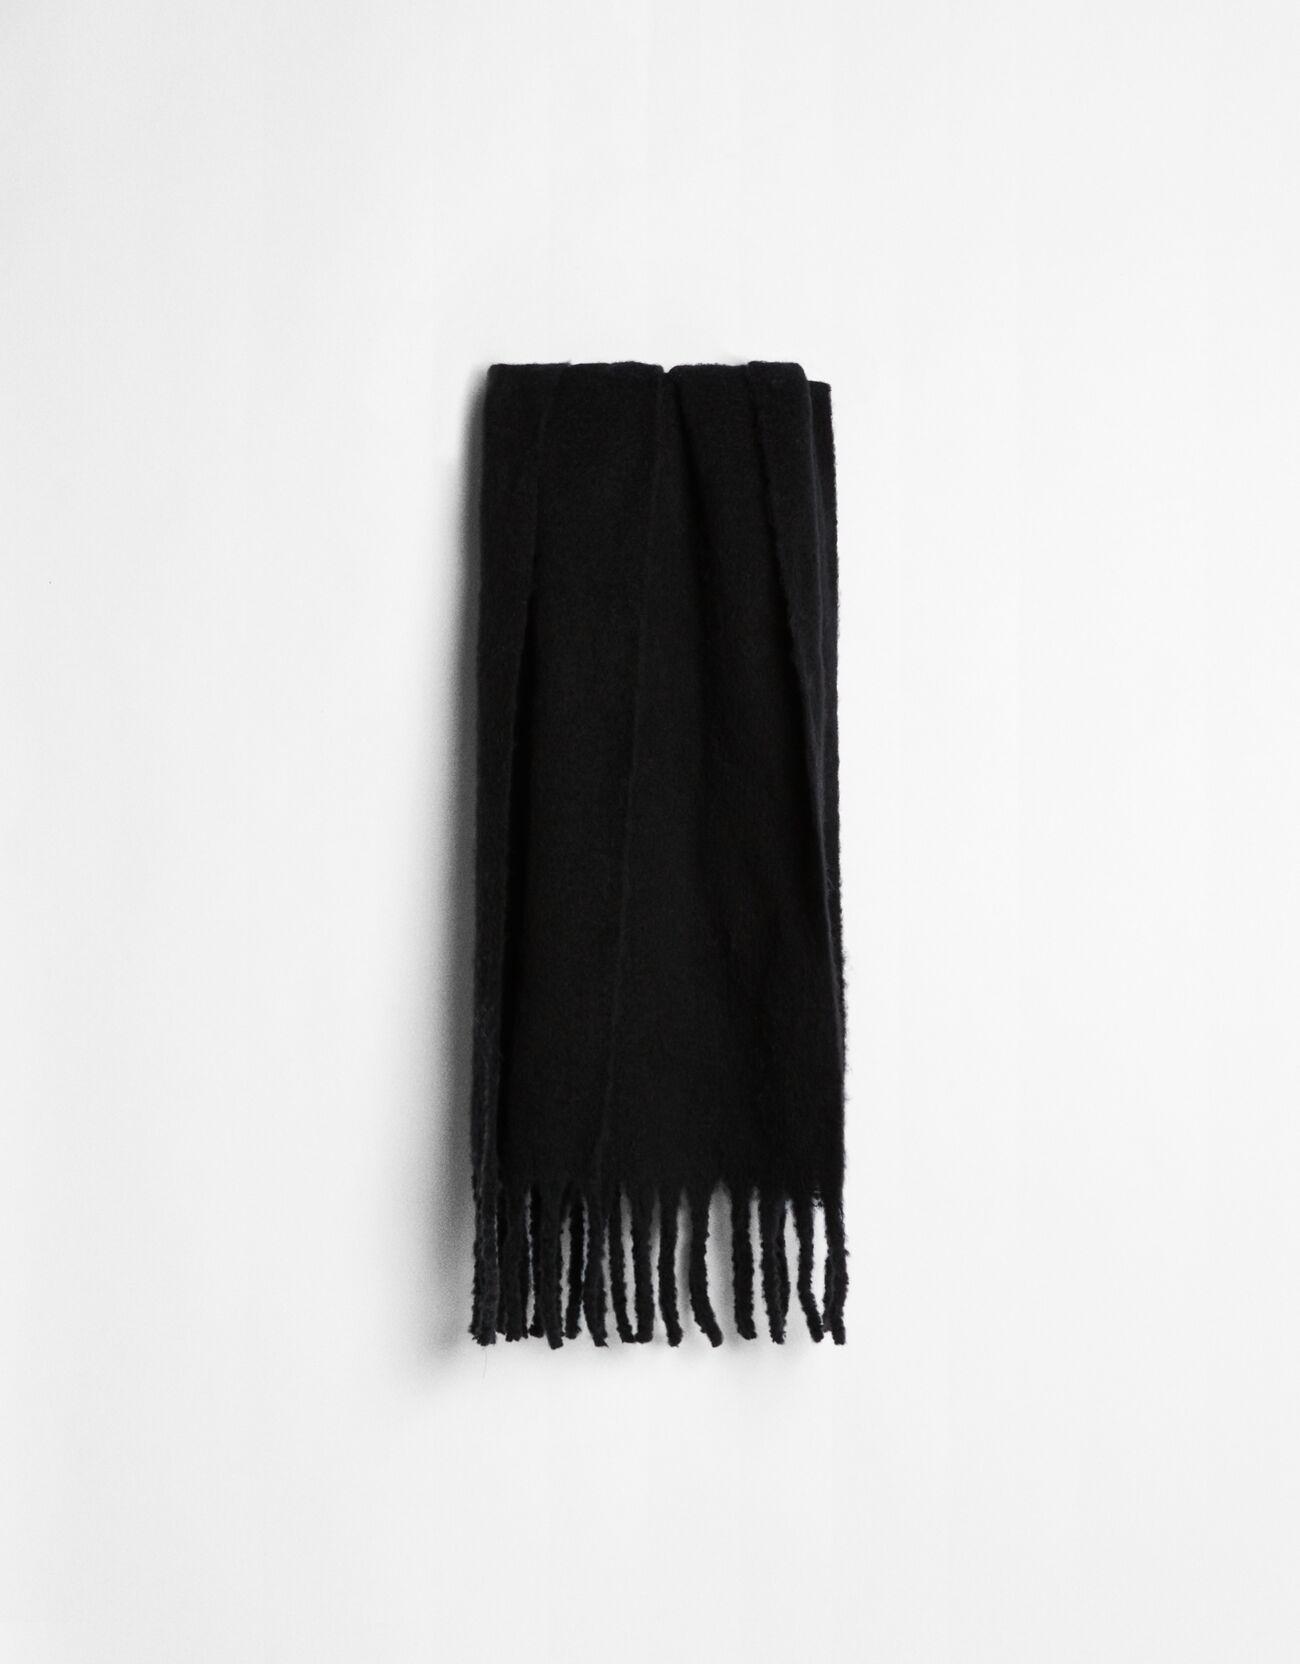 Bufanda oversize de color negro.